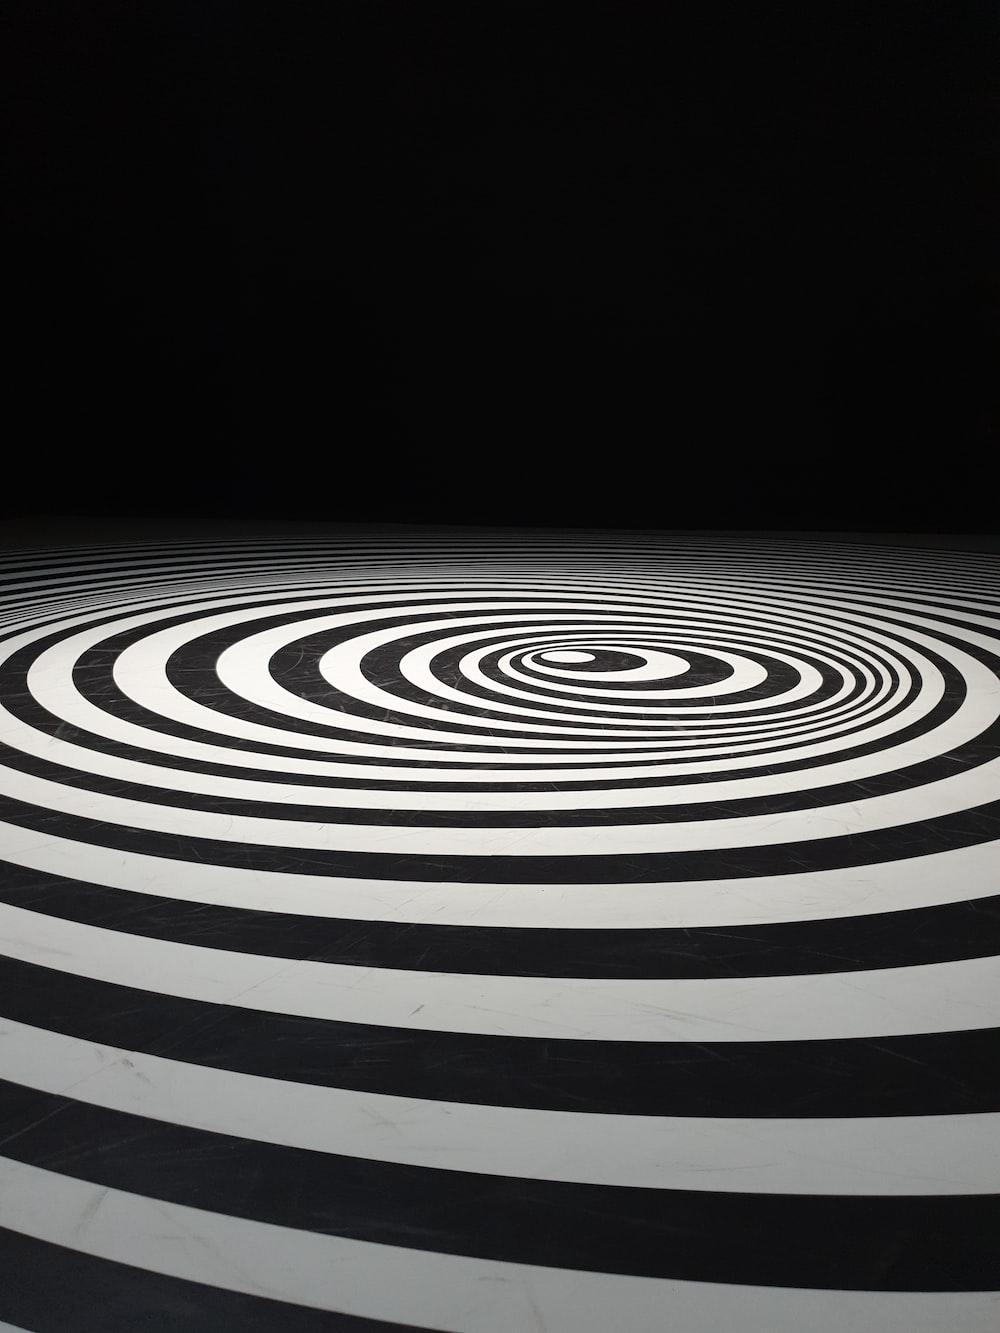 black and white striped round logo